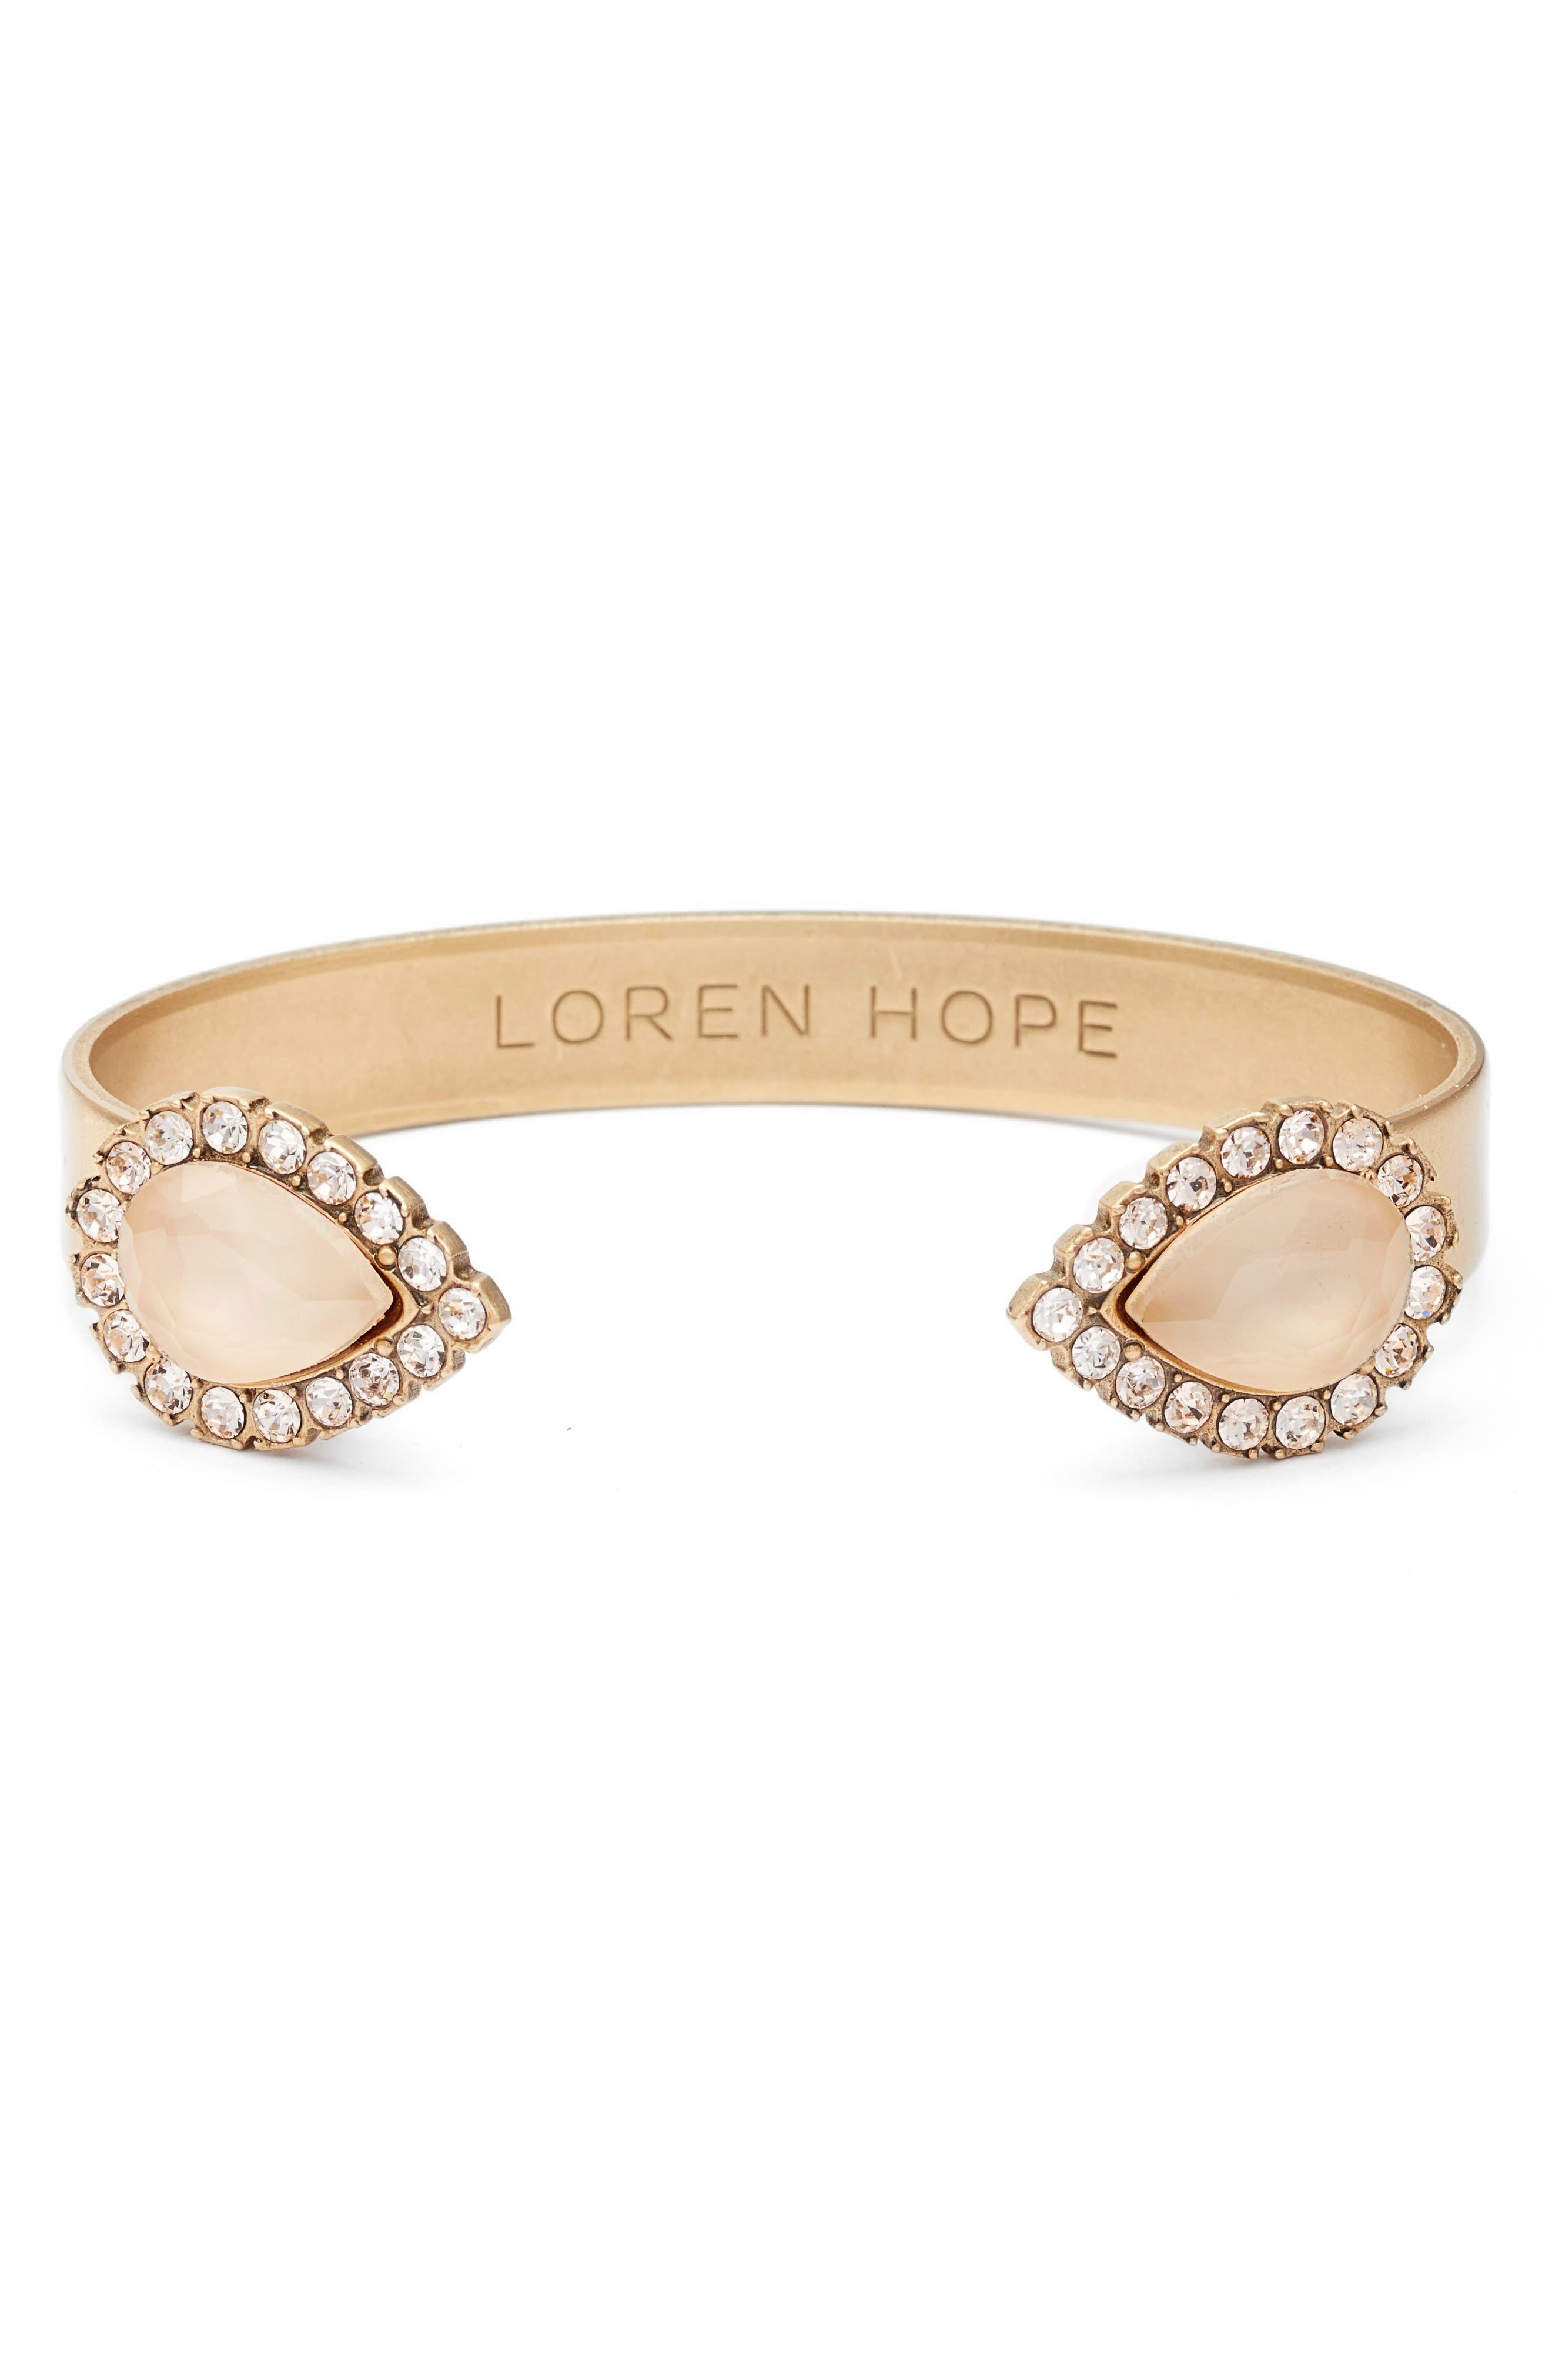 Loren Hope 'Sarra' Crystal Cuff